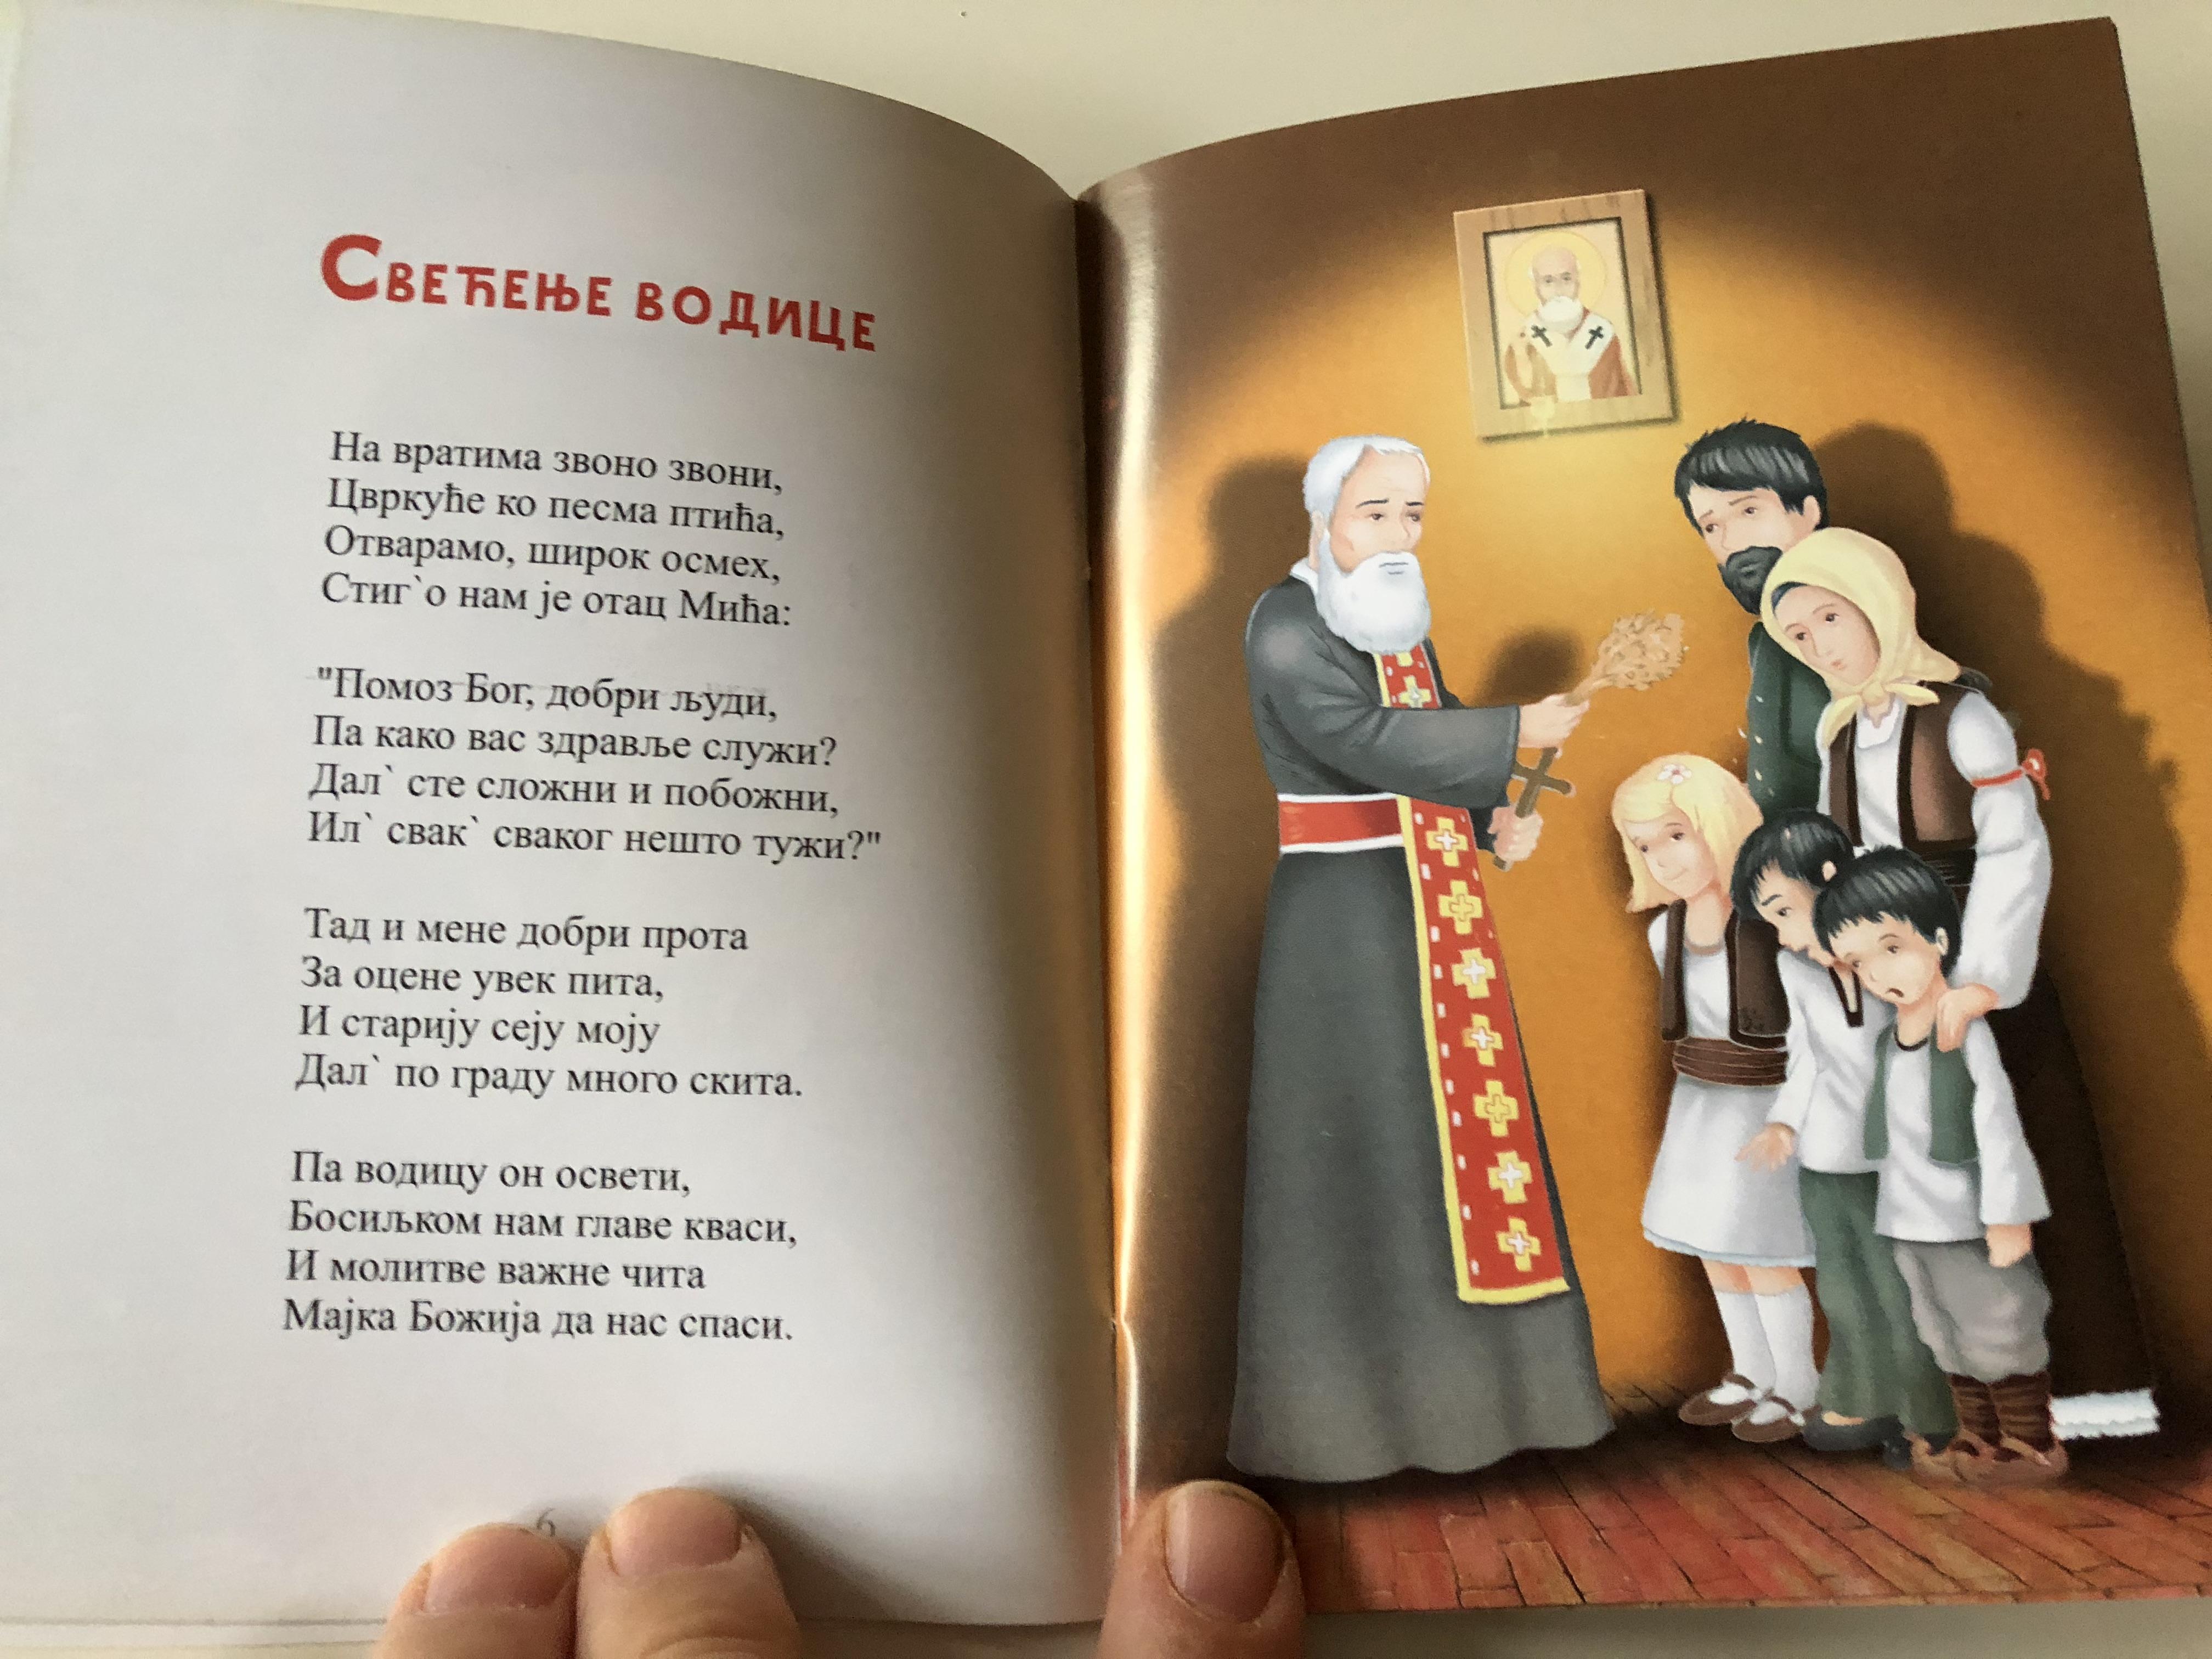 serbian-childrens-poems-orthodox-feasts-5-.jpg